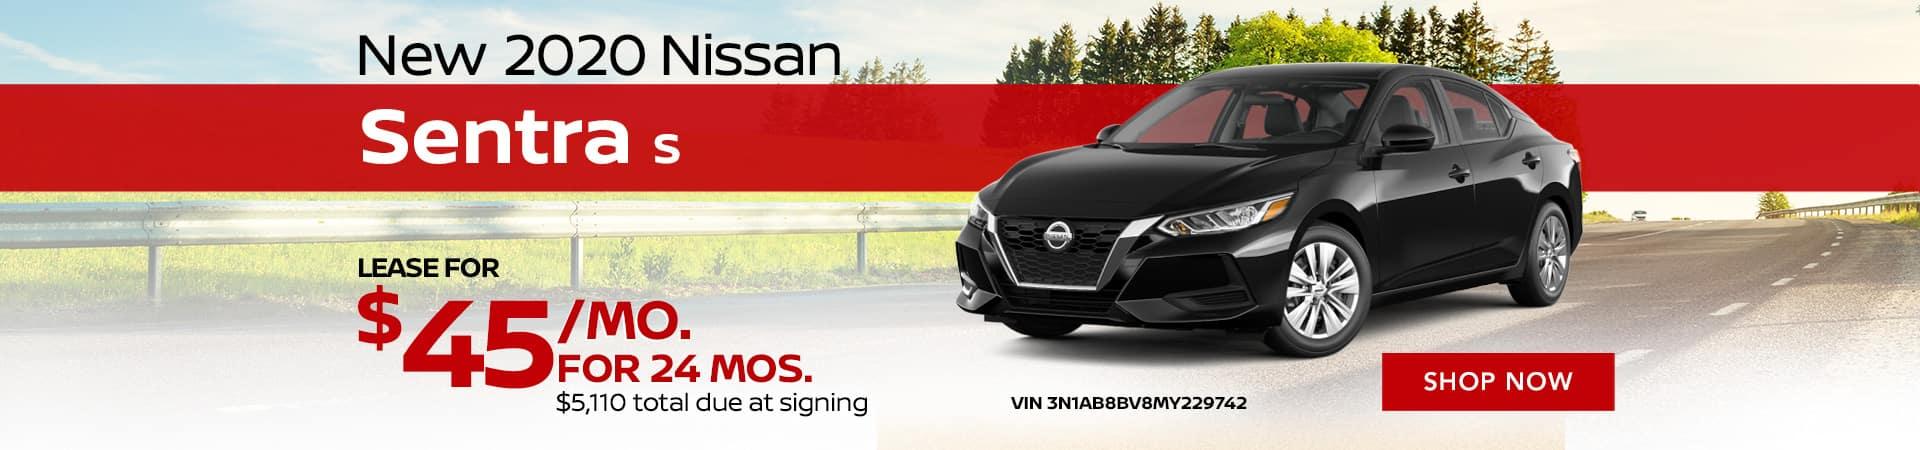 BNW_1920x450_New 2021 Nissan _Sentra S __04'21